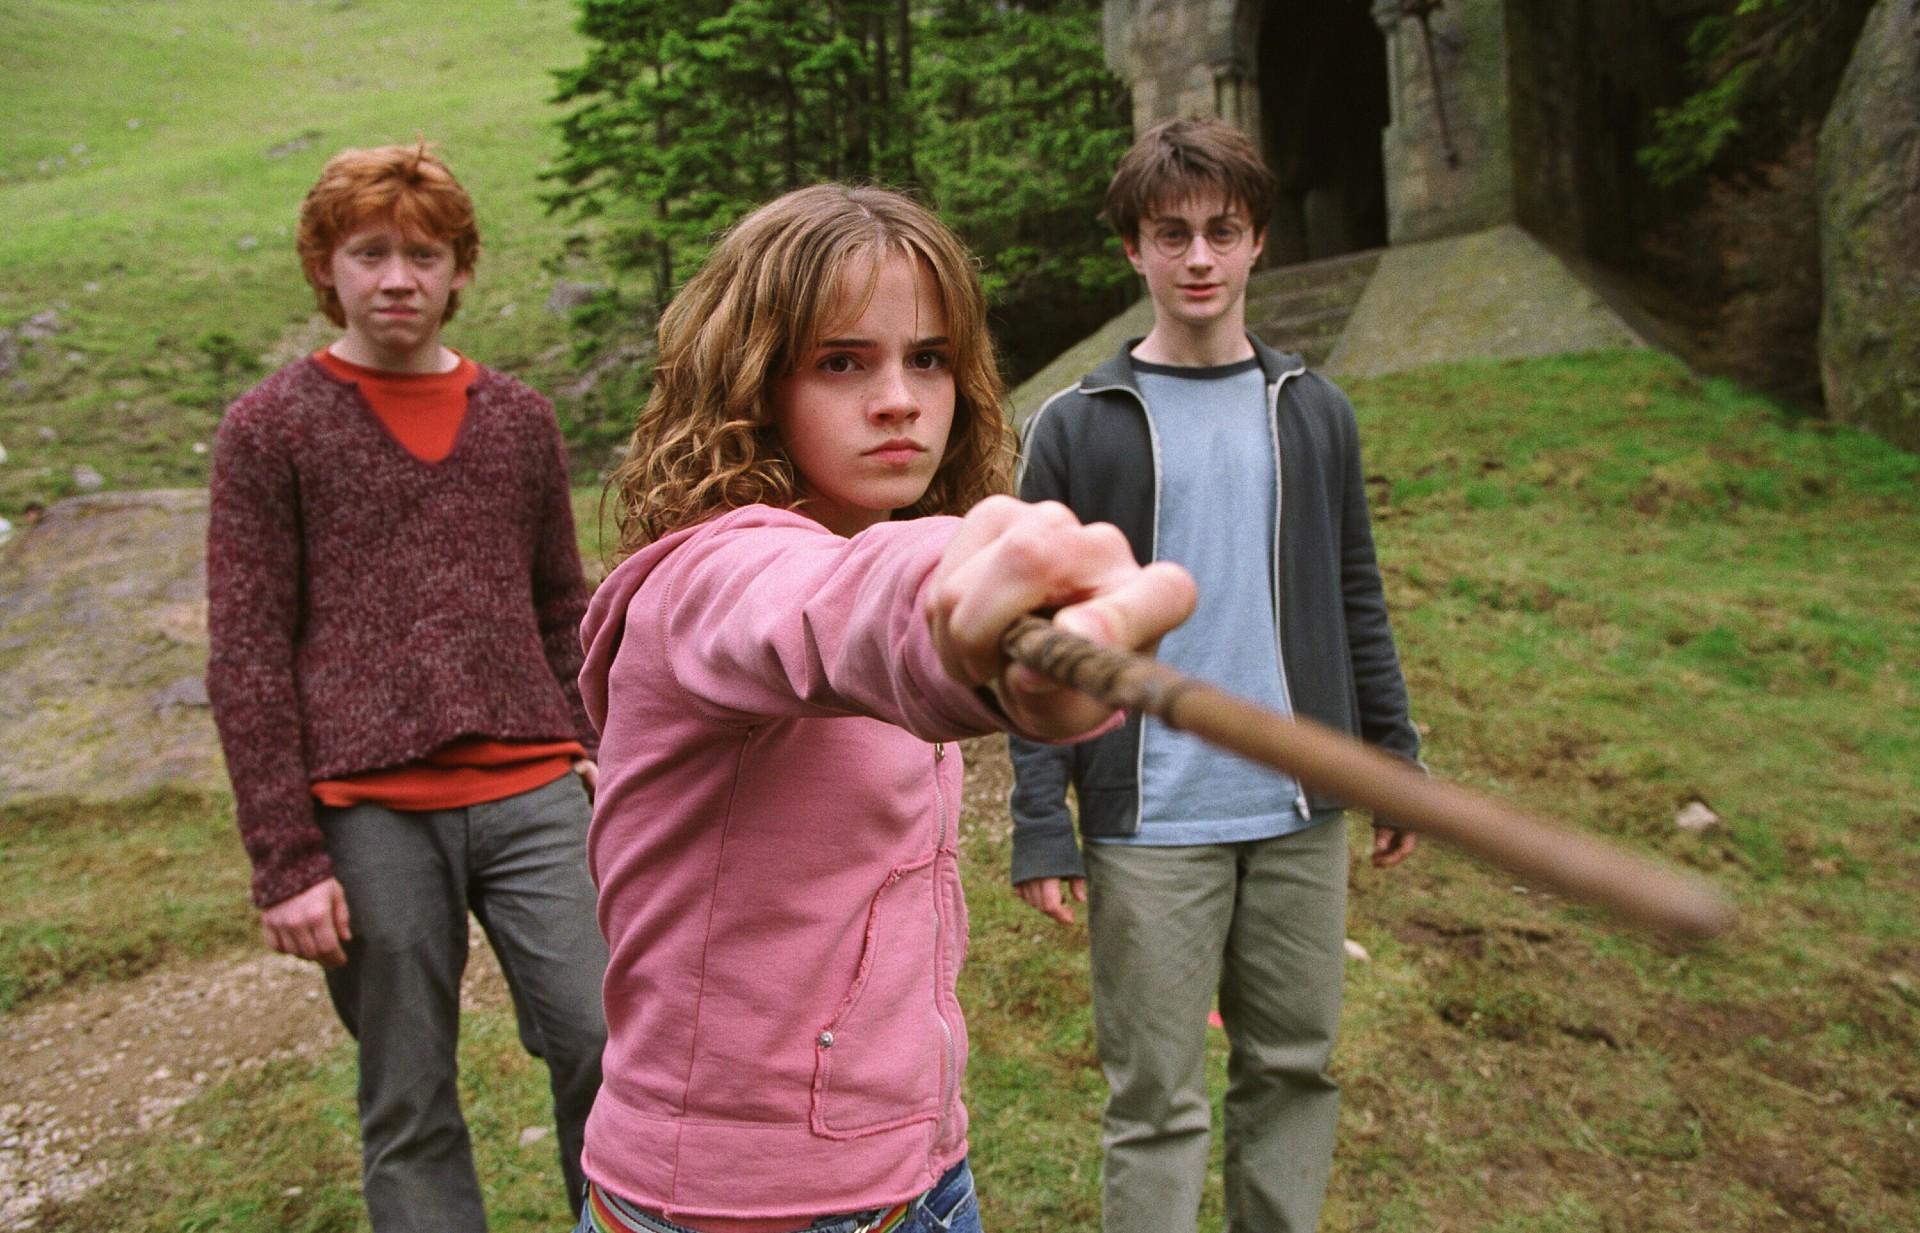 Rupert Grint, Emma Watson, Daniel Radcliffe, Harry Potter and the Prisoner of Azkaban